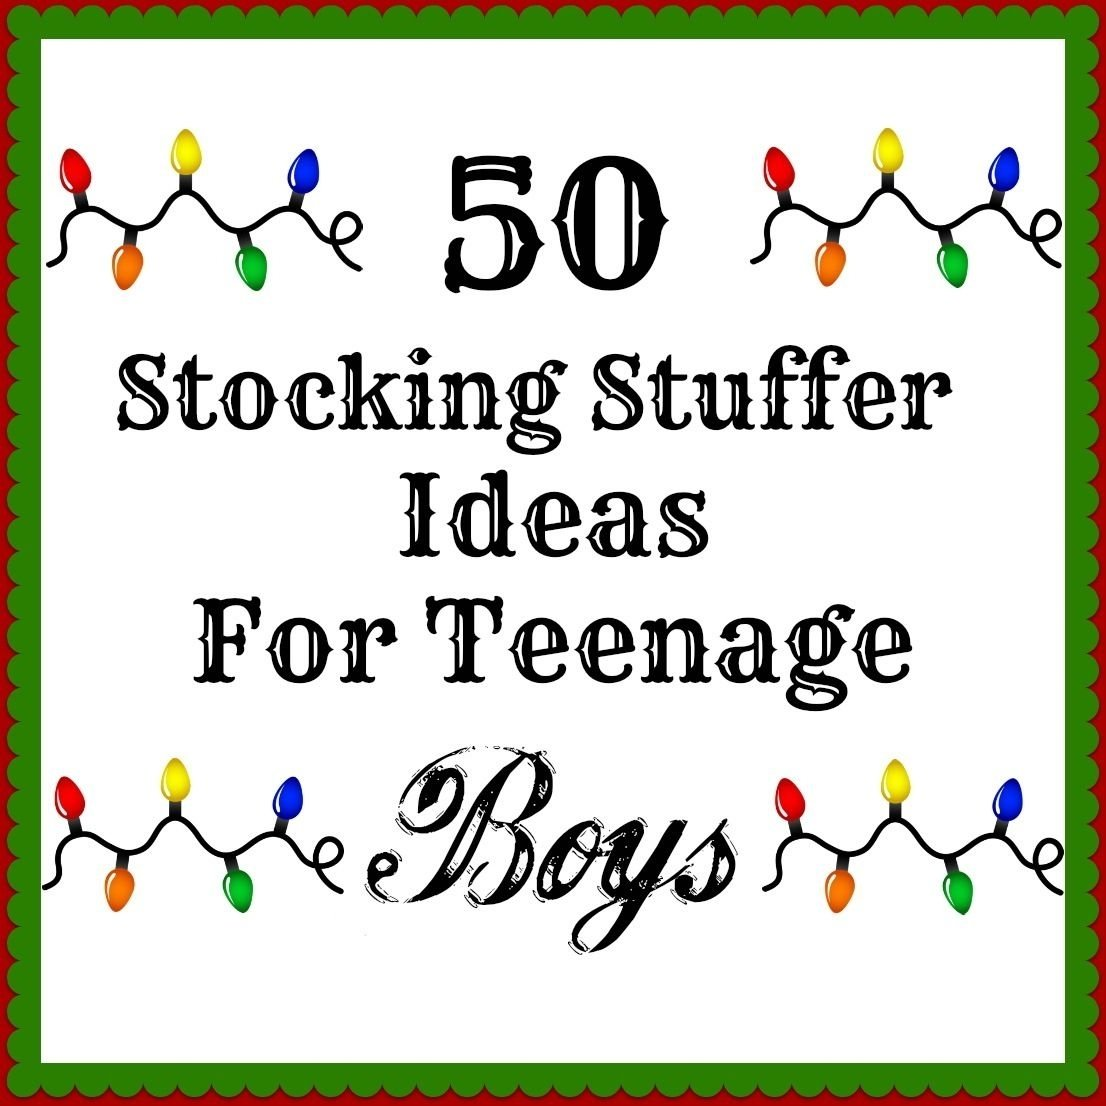 10 Spectacular Stocking Stuffer Ideas For Teenagers 50 stocking stuffers for teenage boys holidays pinterest 2020